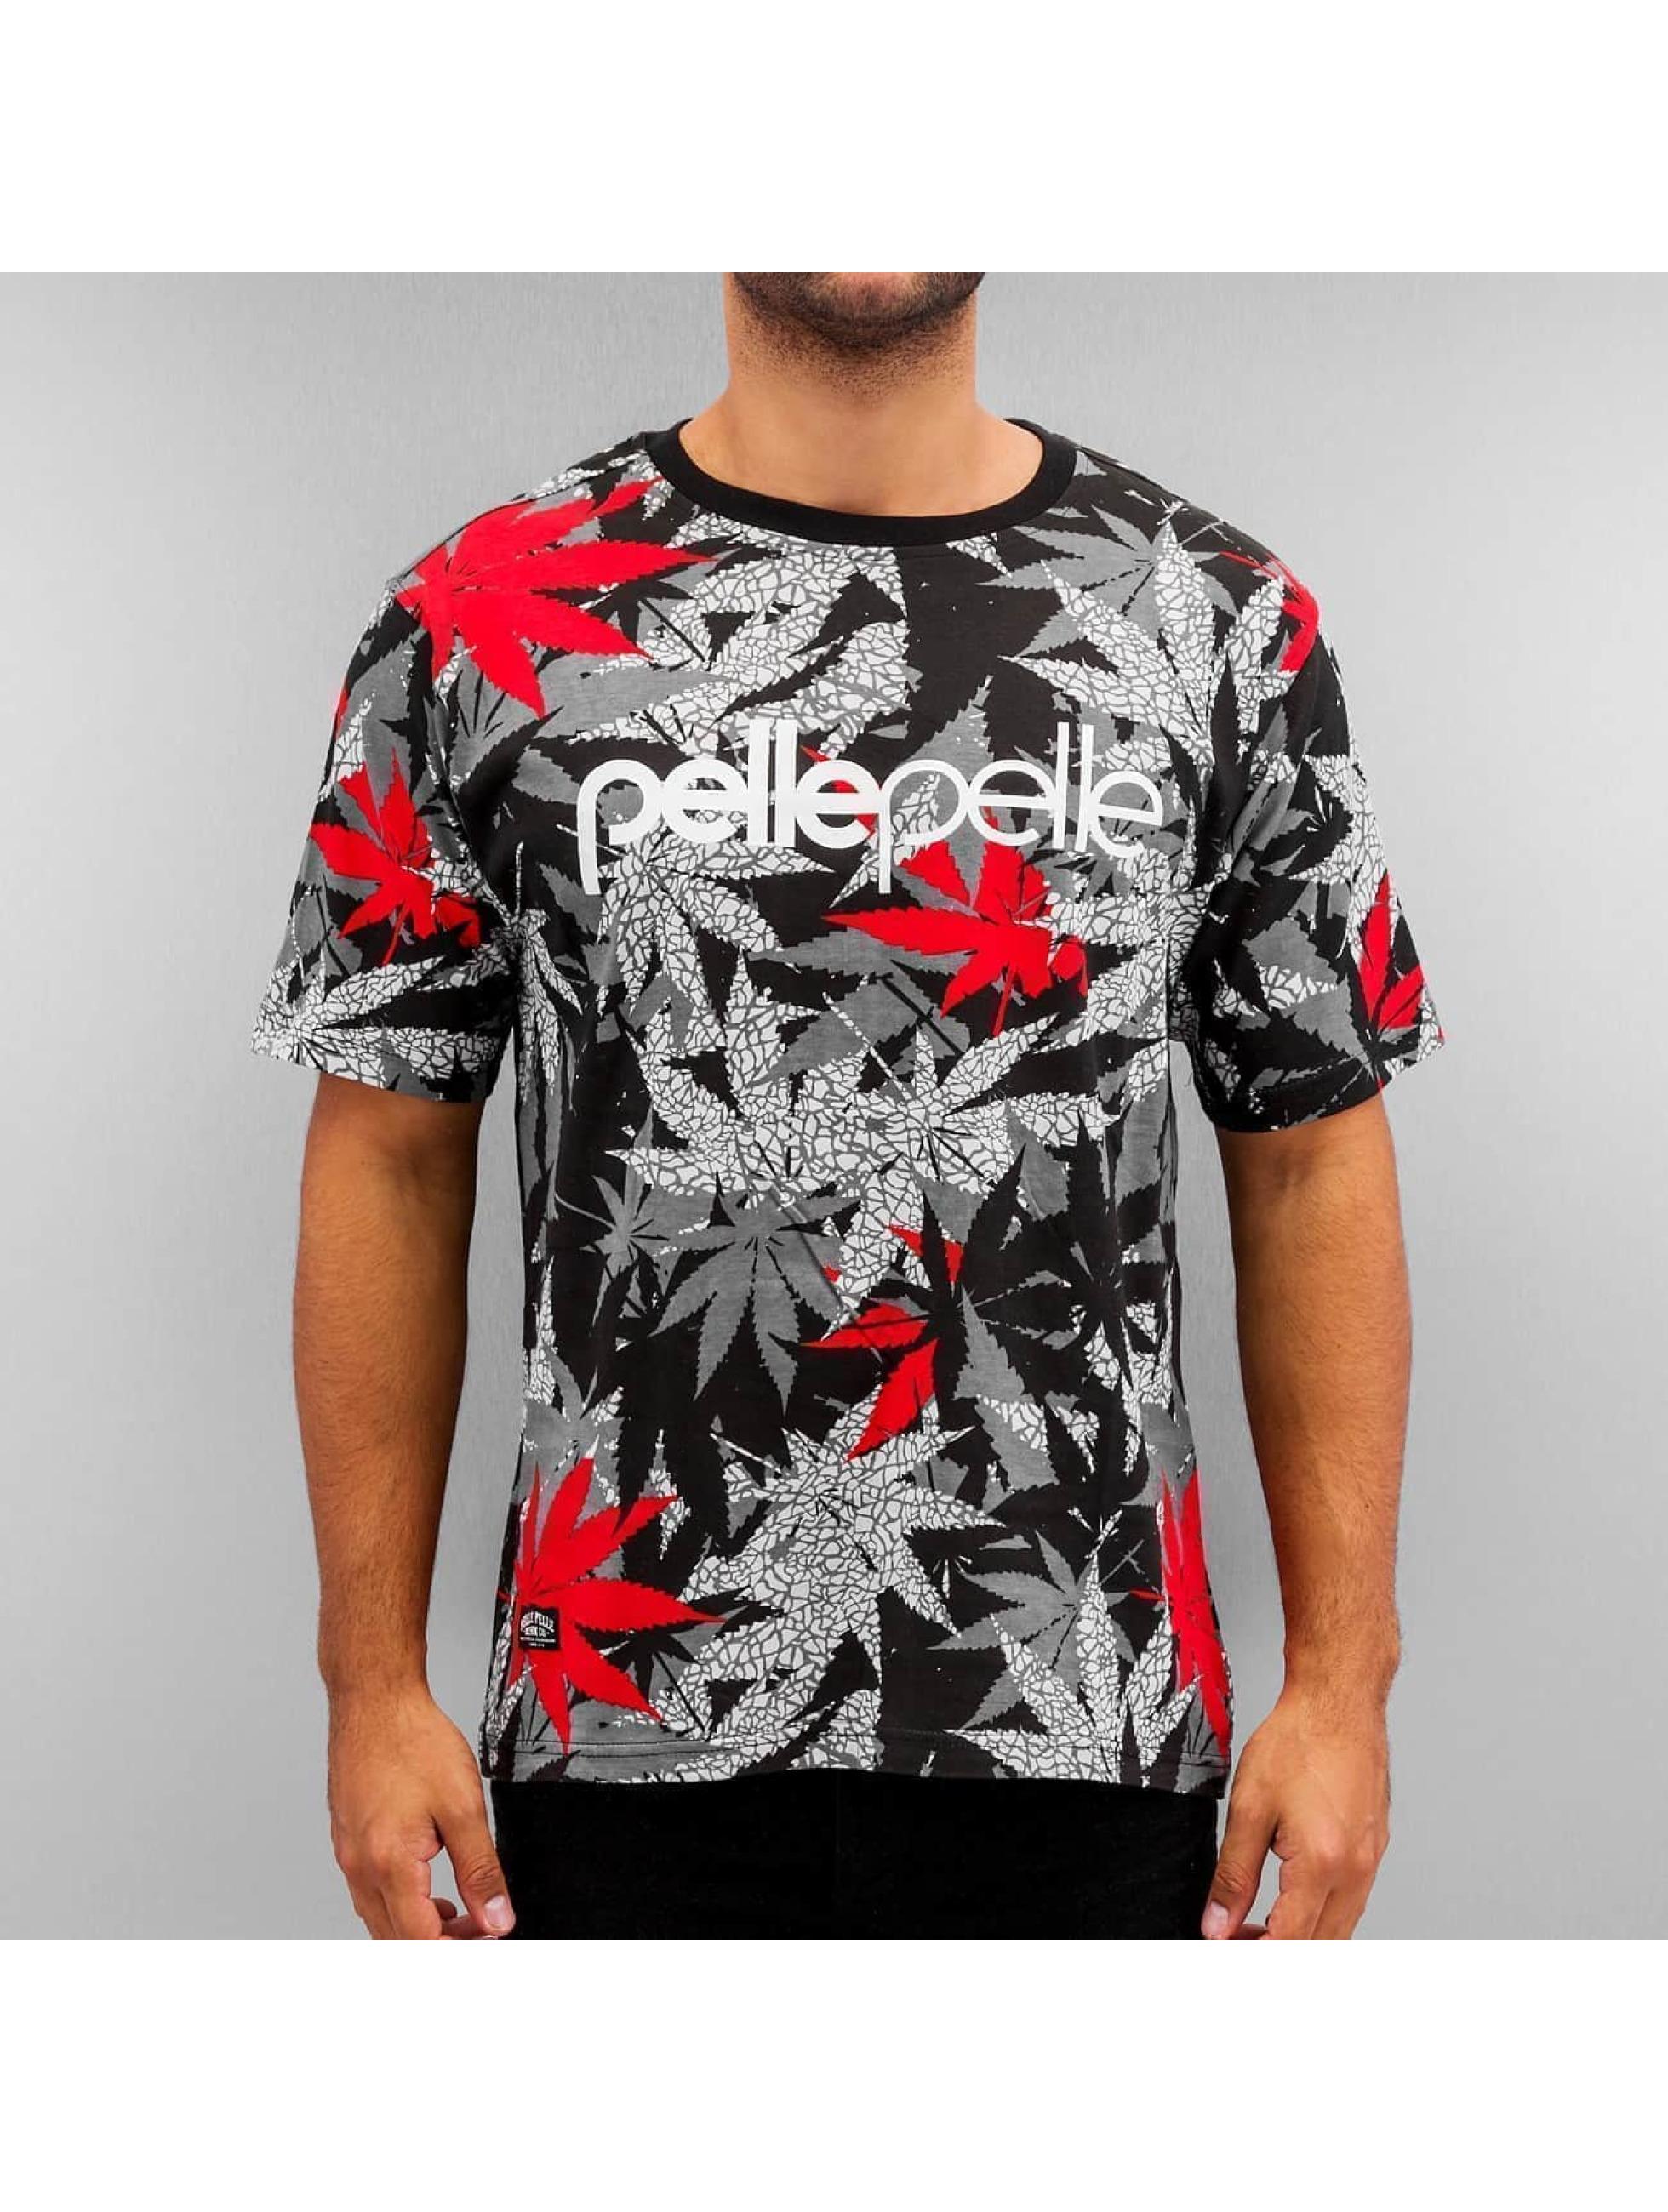 Pelle Pelle T-shirts Corporate Dope sort